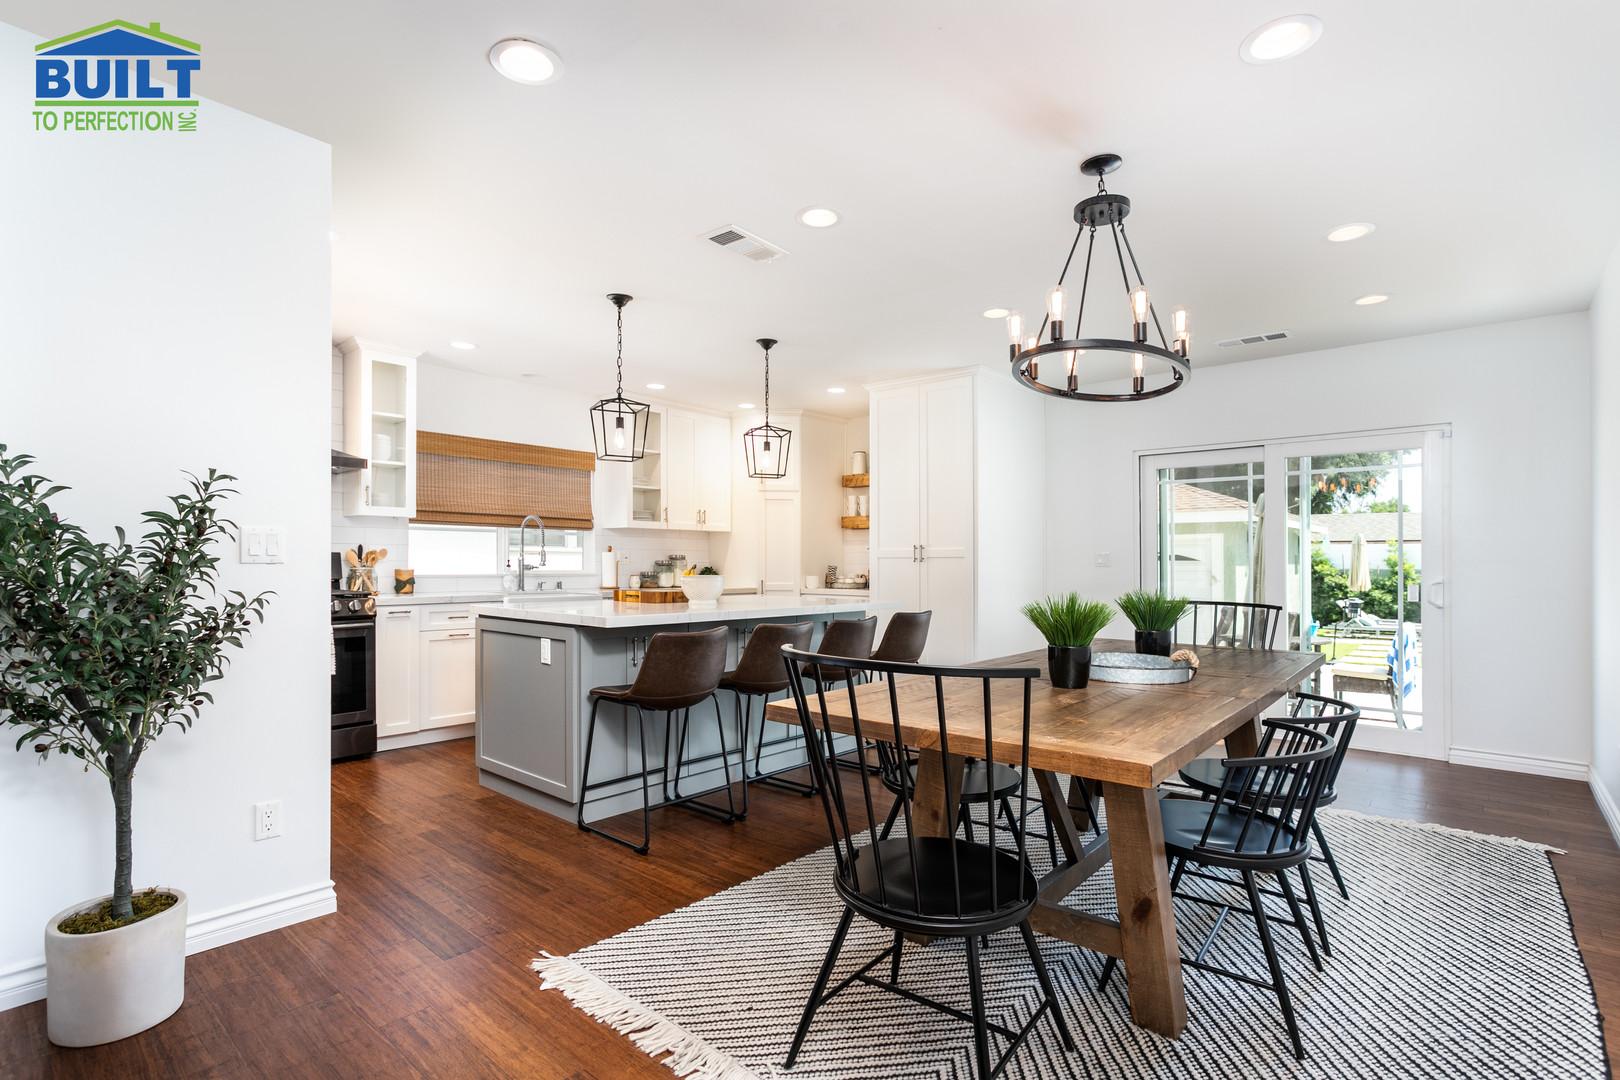 Kitchen & Dining Room Remodel